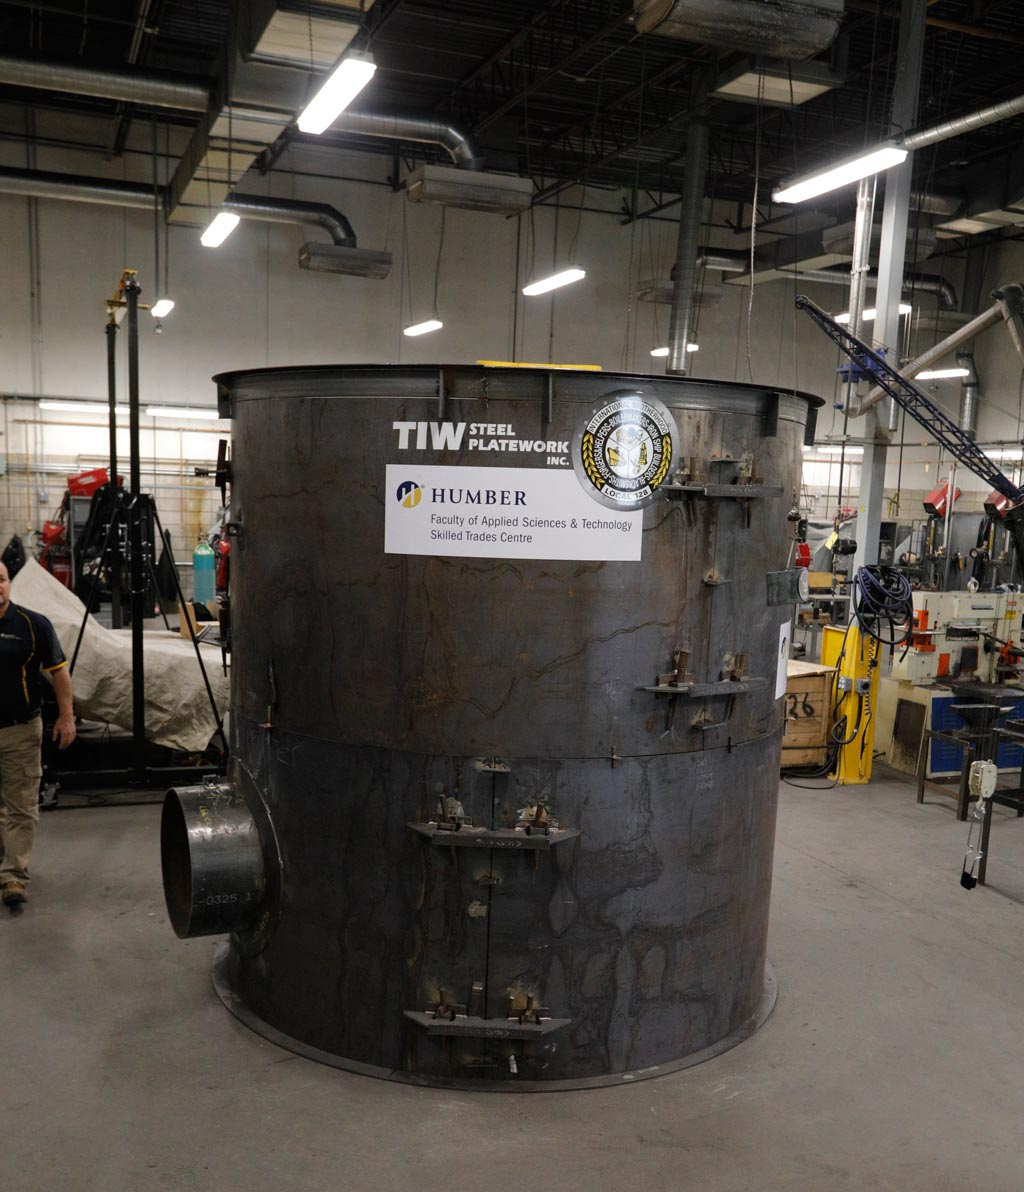 humber-college-tiw-steel-platework-donation-api-650-tank-2